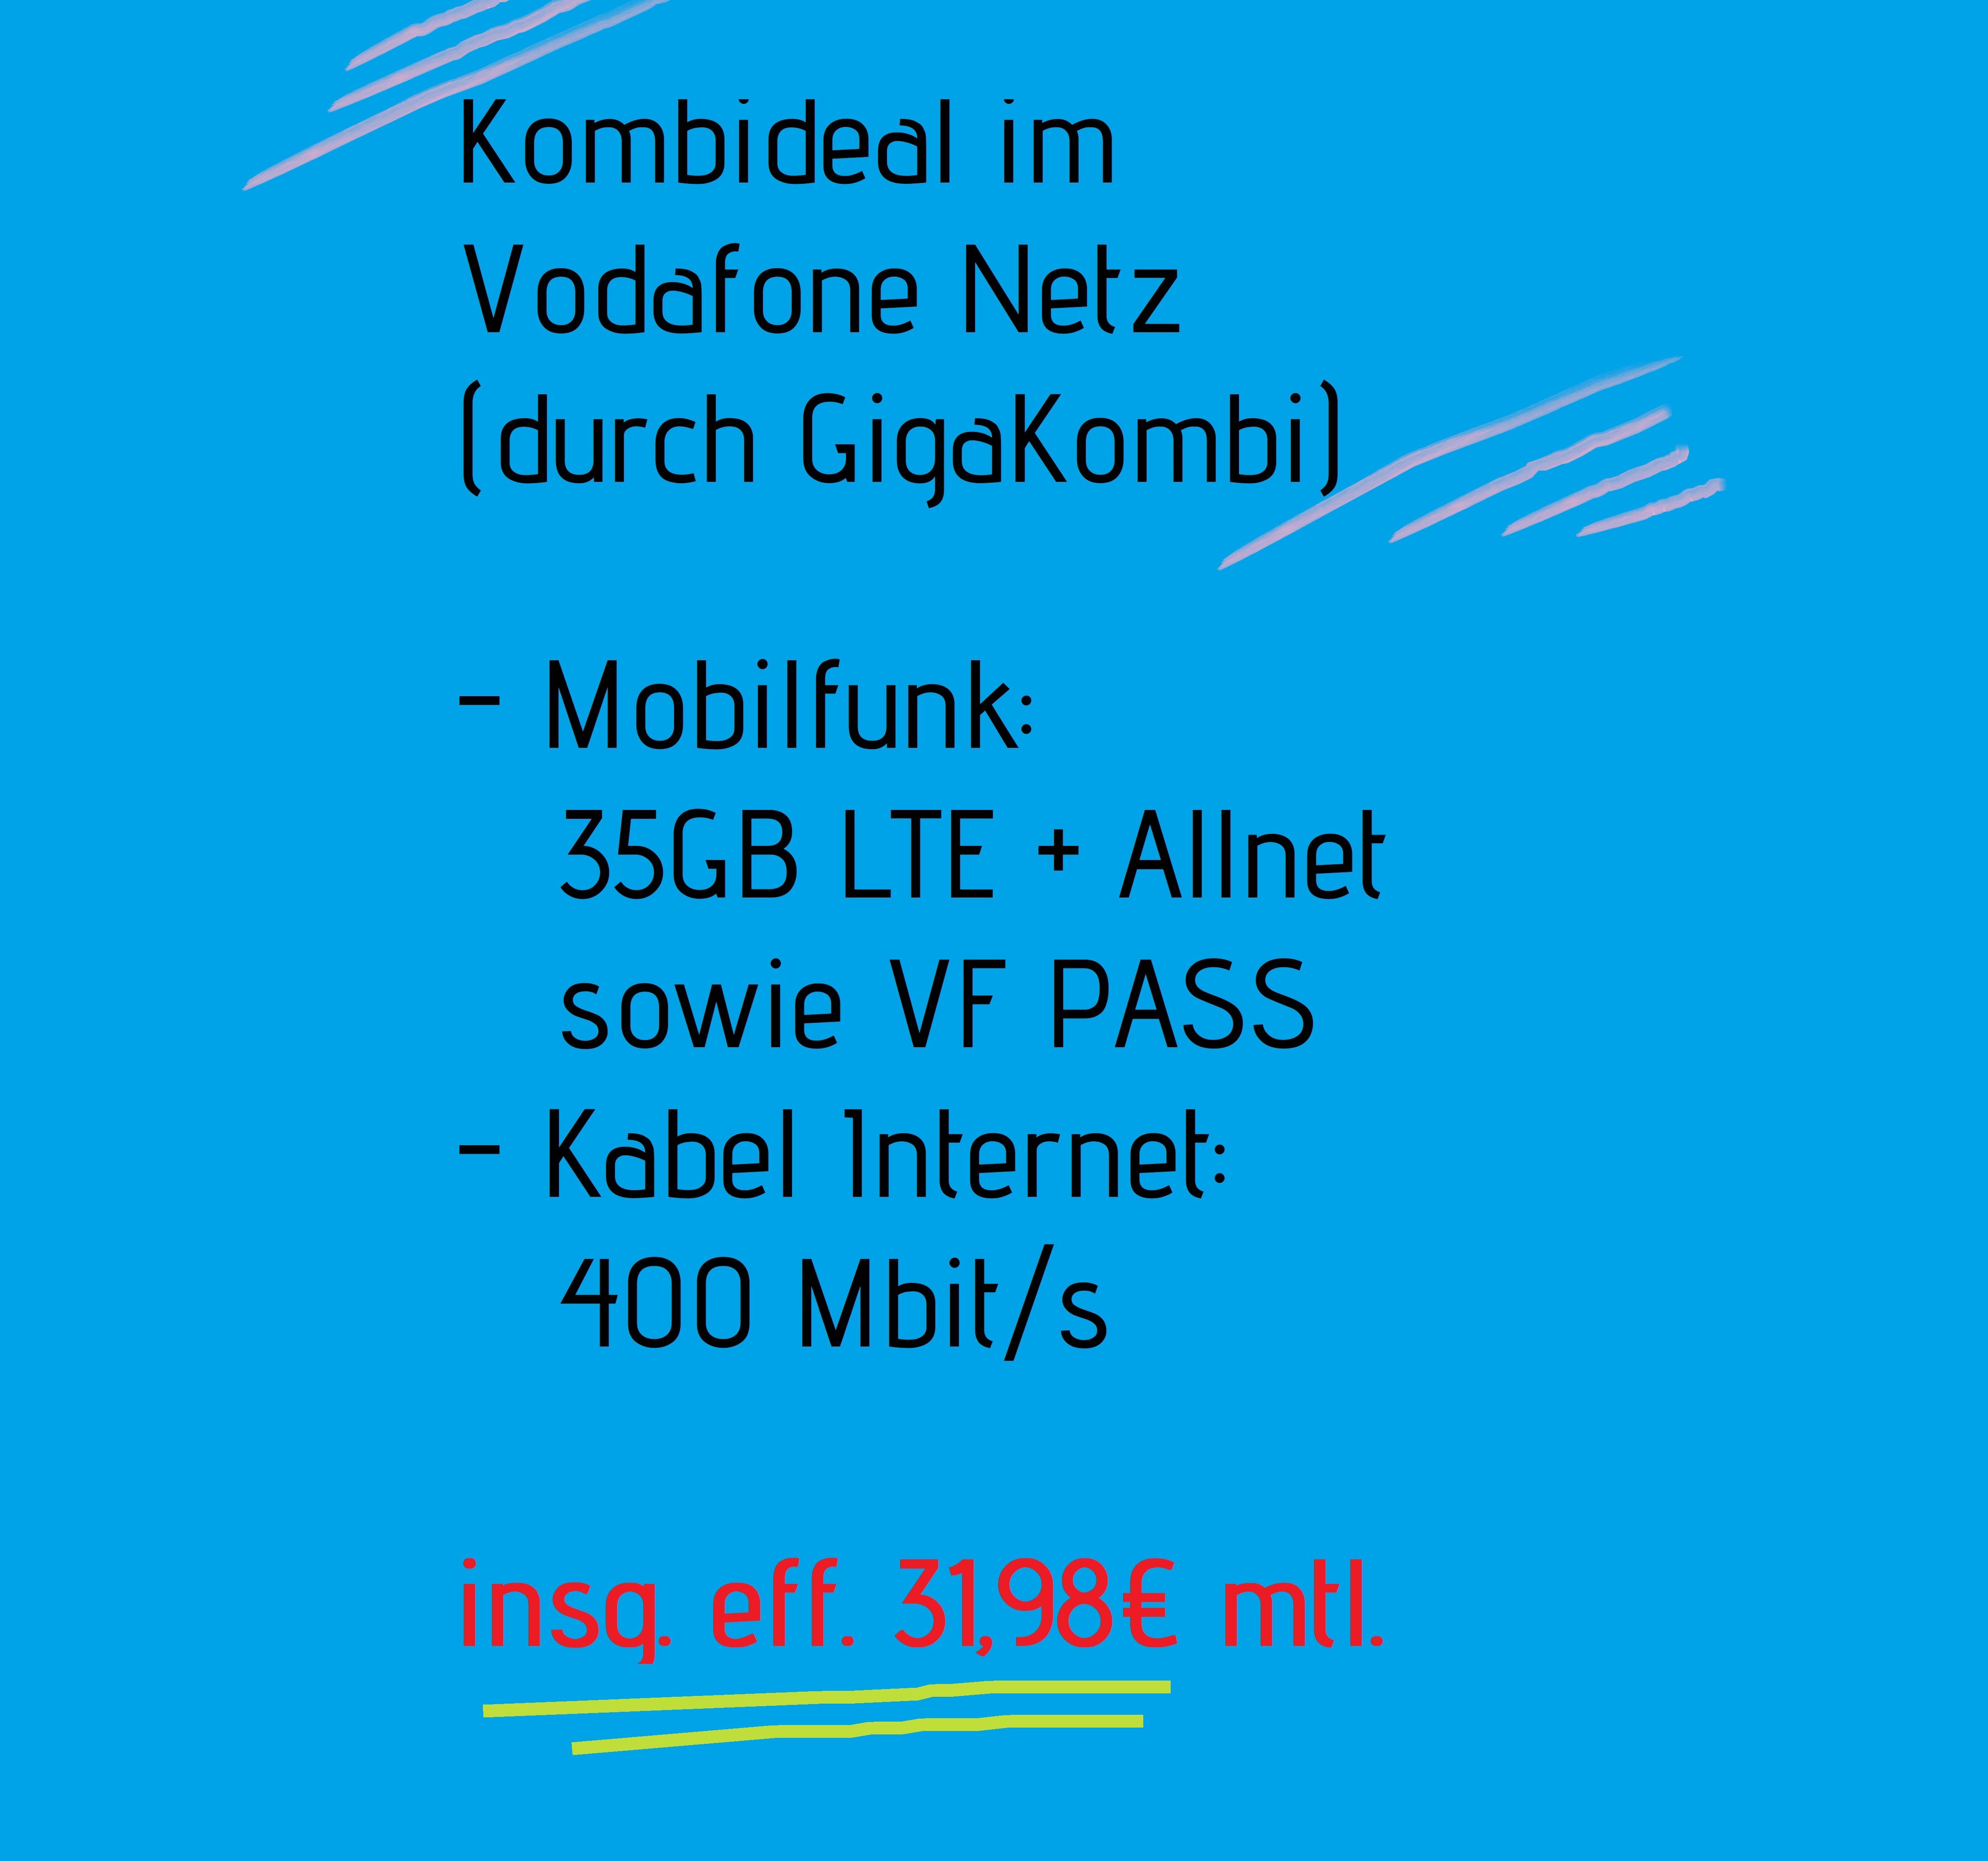 [VF Young] 25GB LTE + ALLNET eff. 26,99 mtl. | mit GK 35GB eff. 16,99€ sowie Kabel 400 eff. 14,99 mtl.